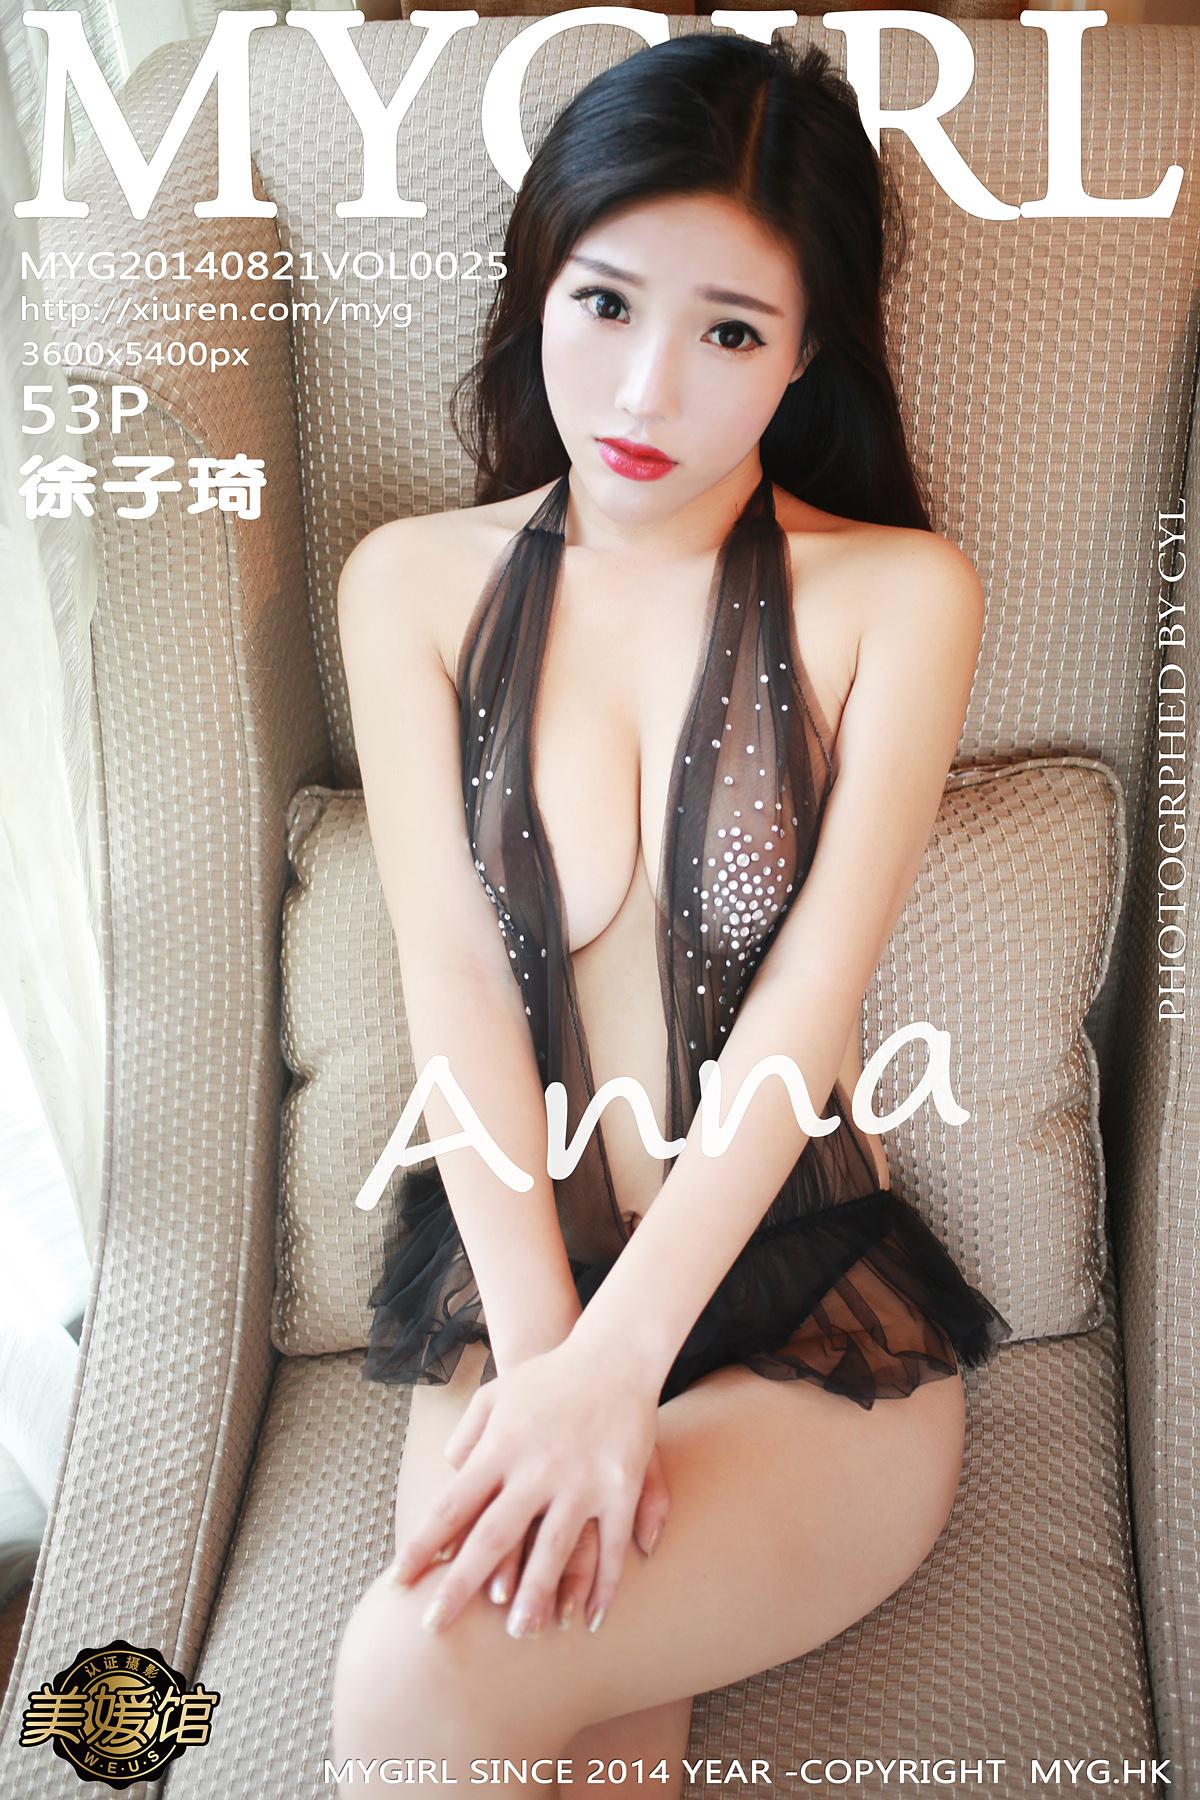 [MyGirl美媛馆]新刊 Vol.001-050套图合集打包下载[13GB]